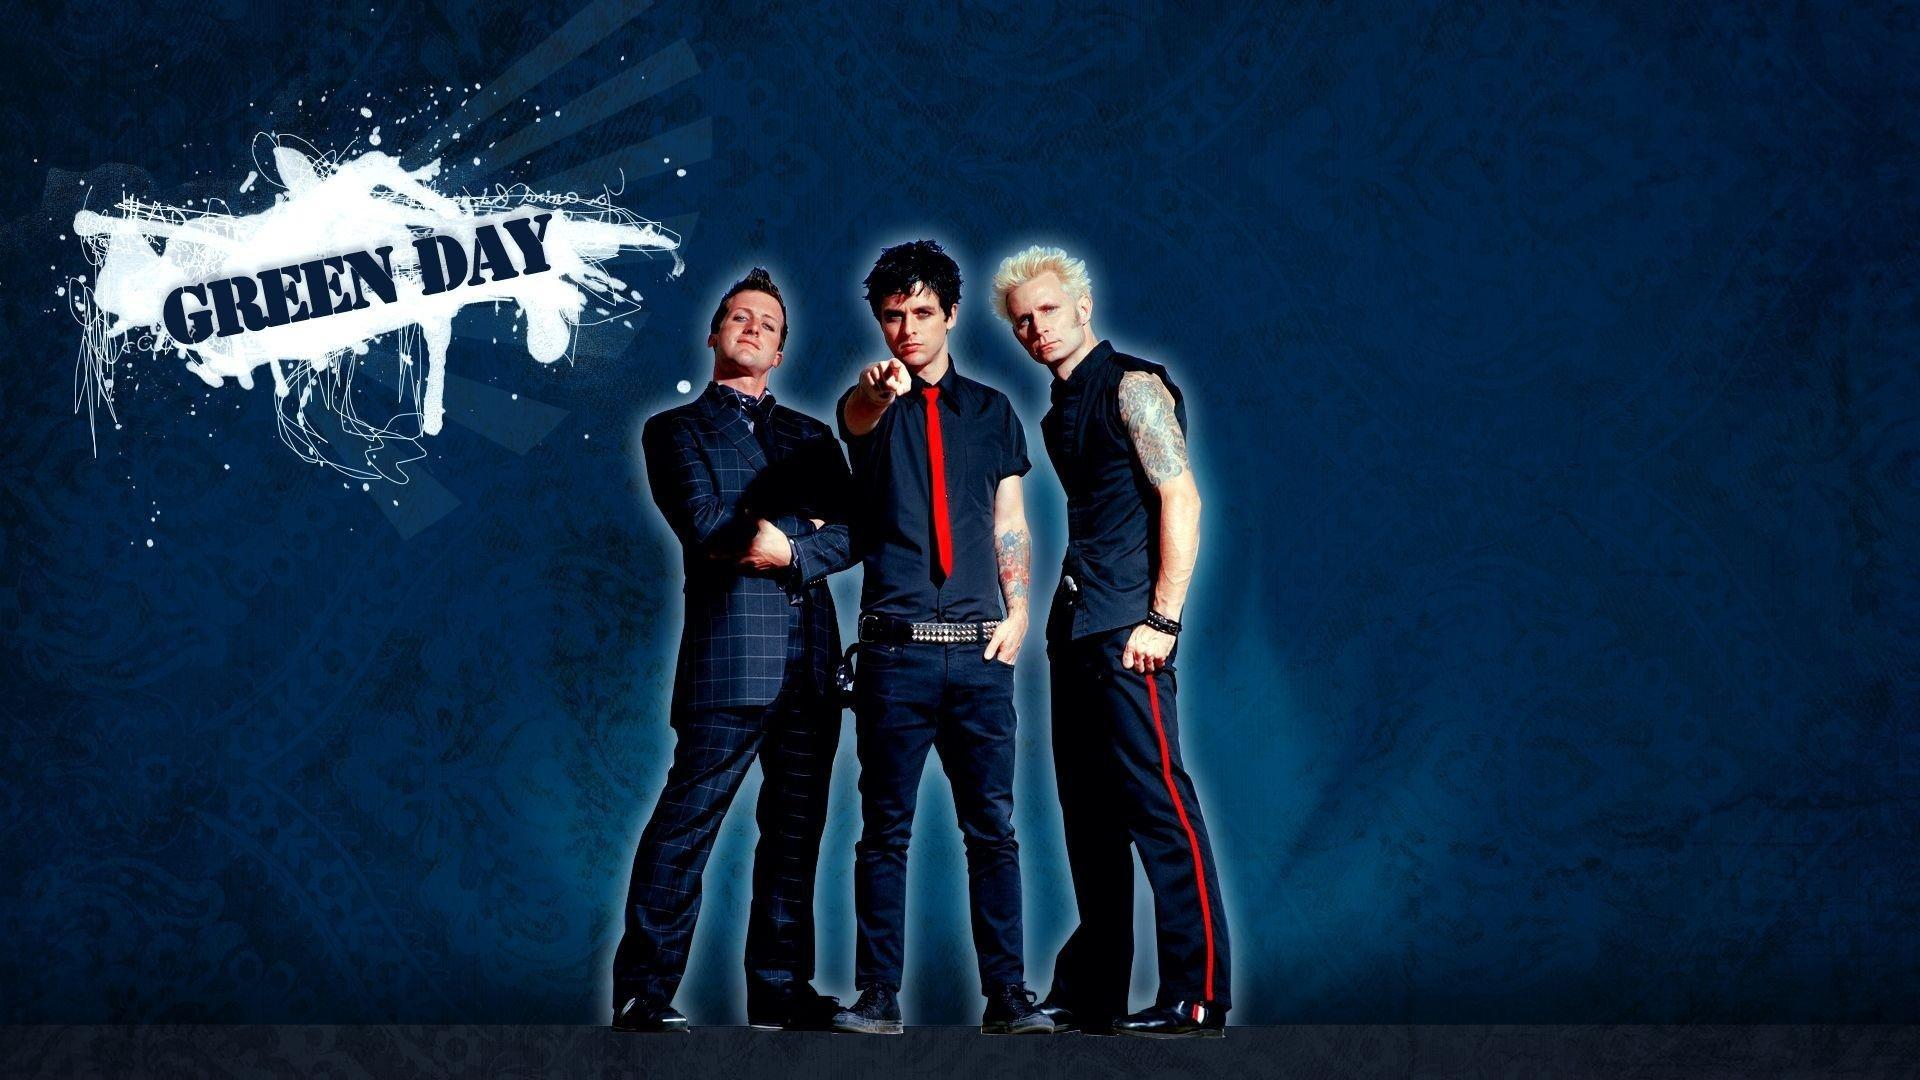 Green Day Wallpaper Free